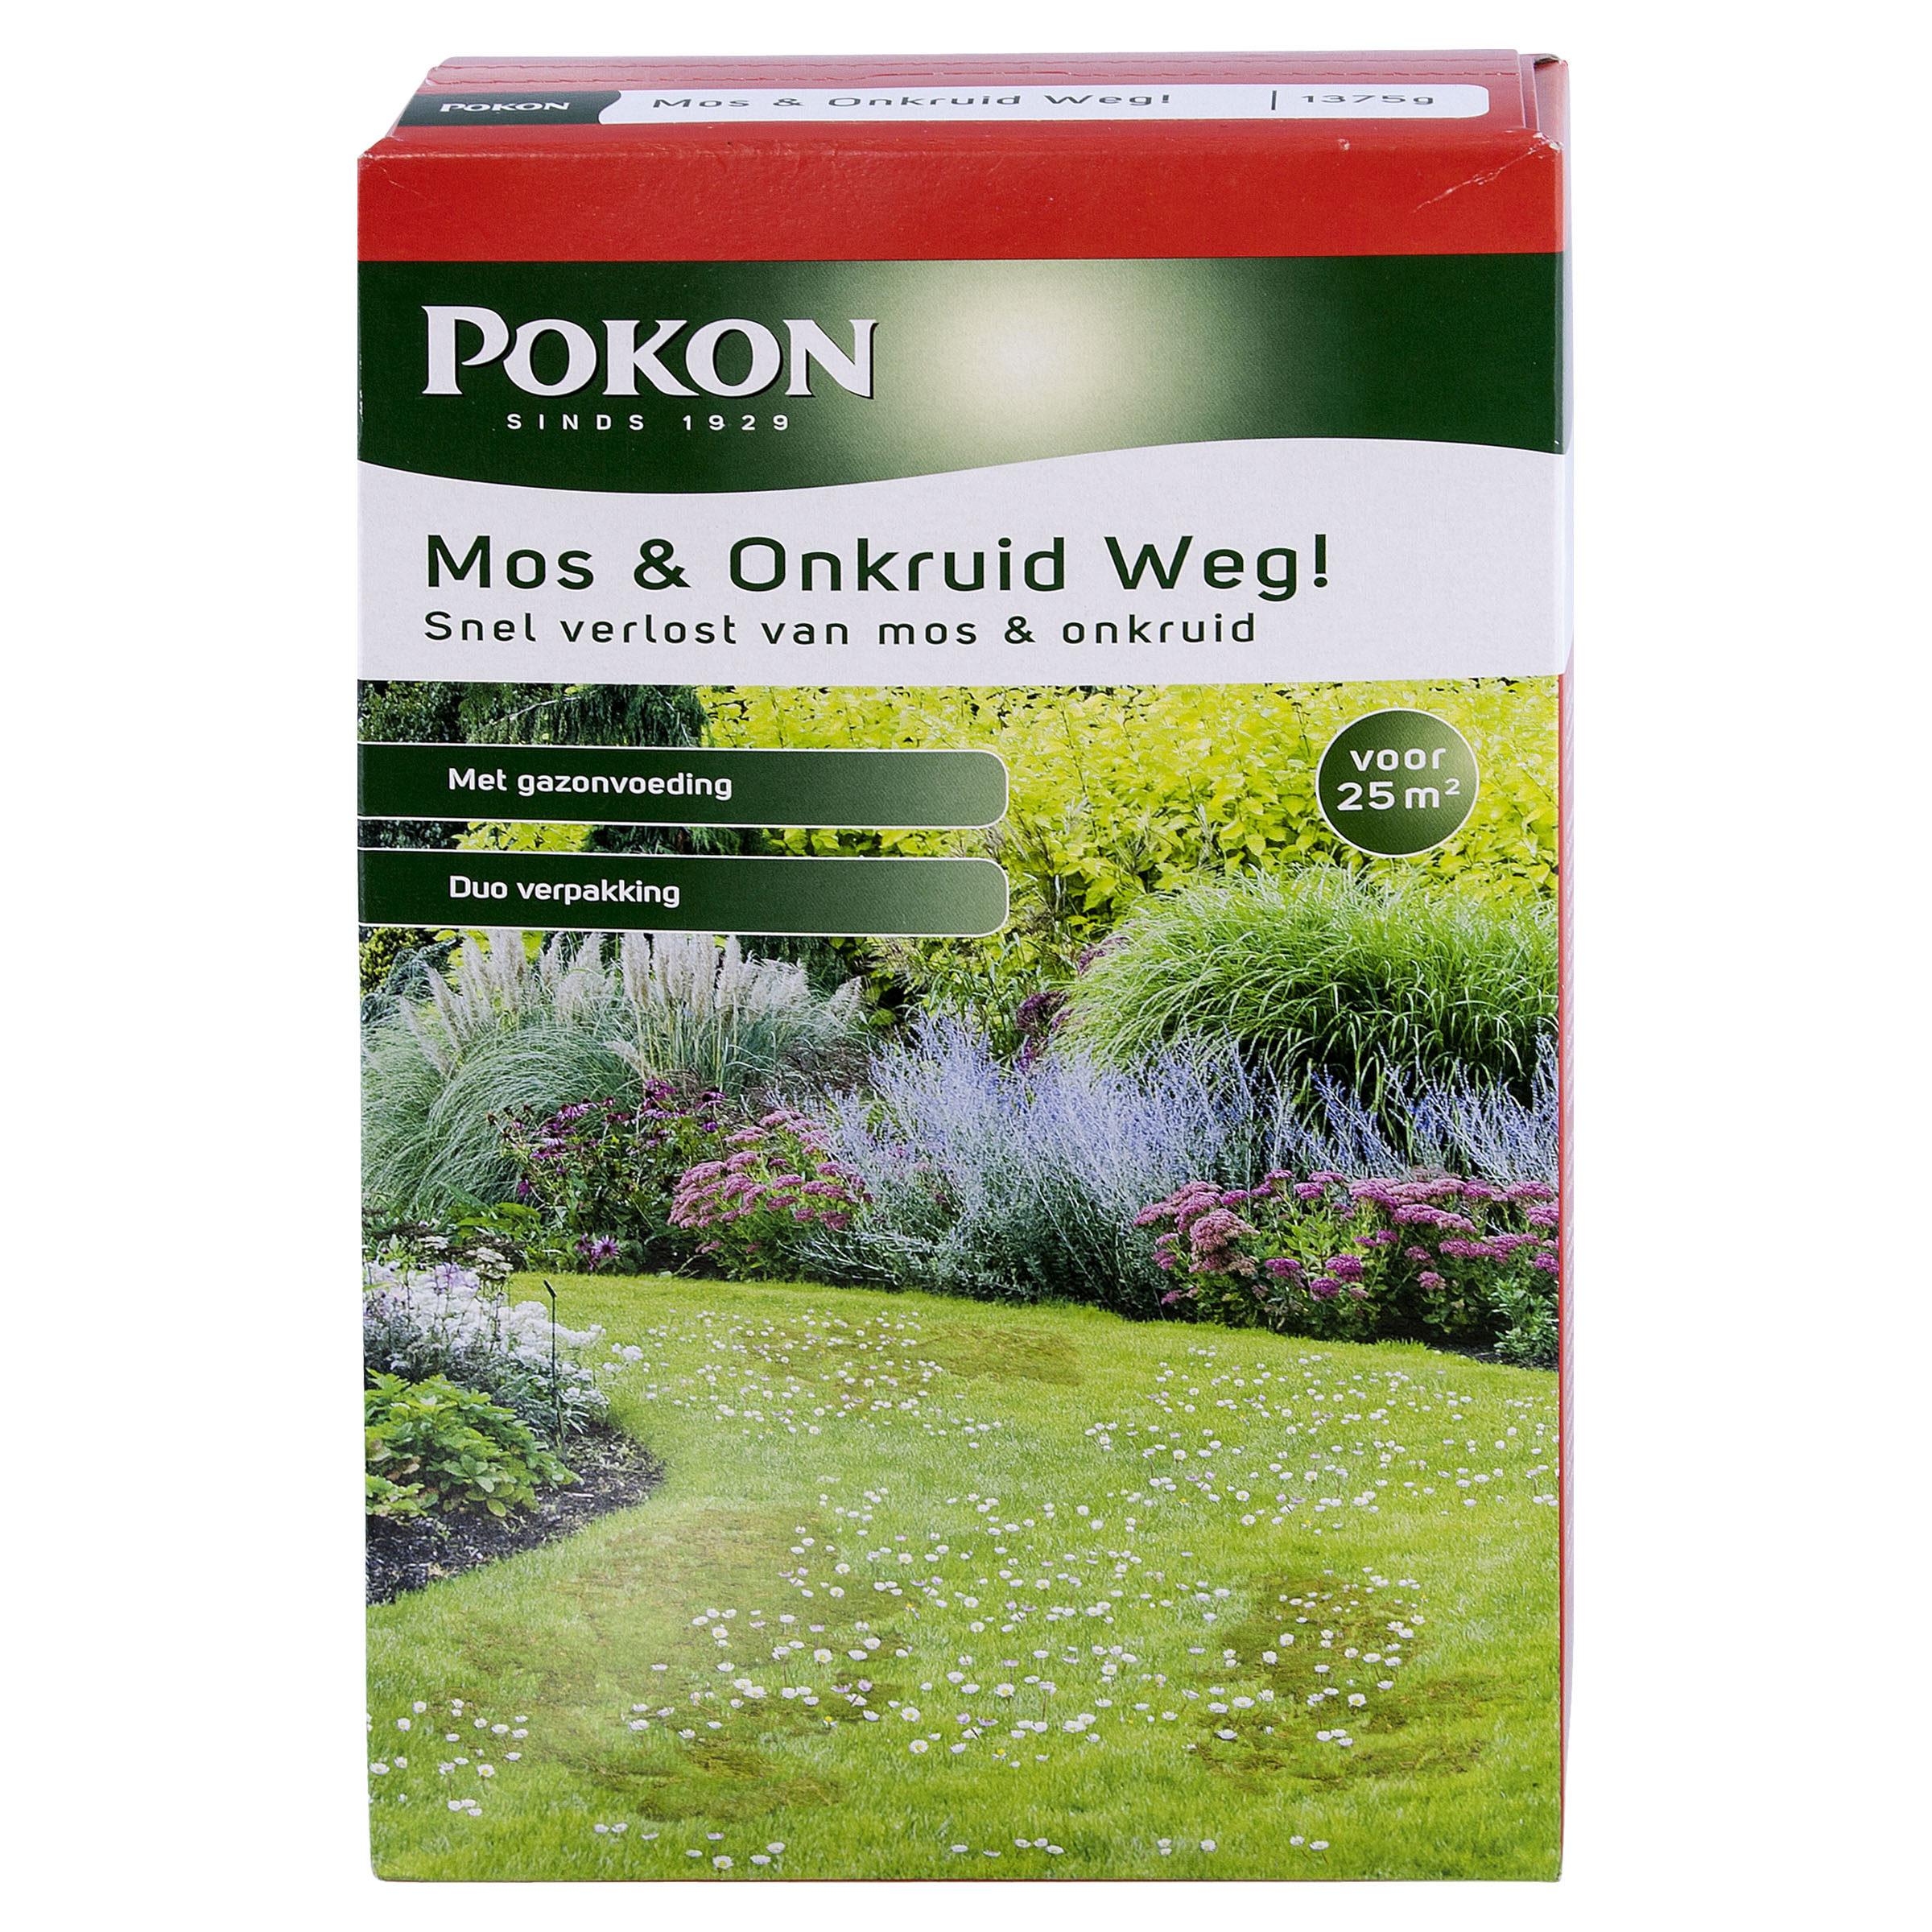 Pokon Mos & Onkruid Weg! 1250gr - cover